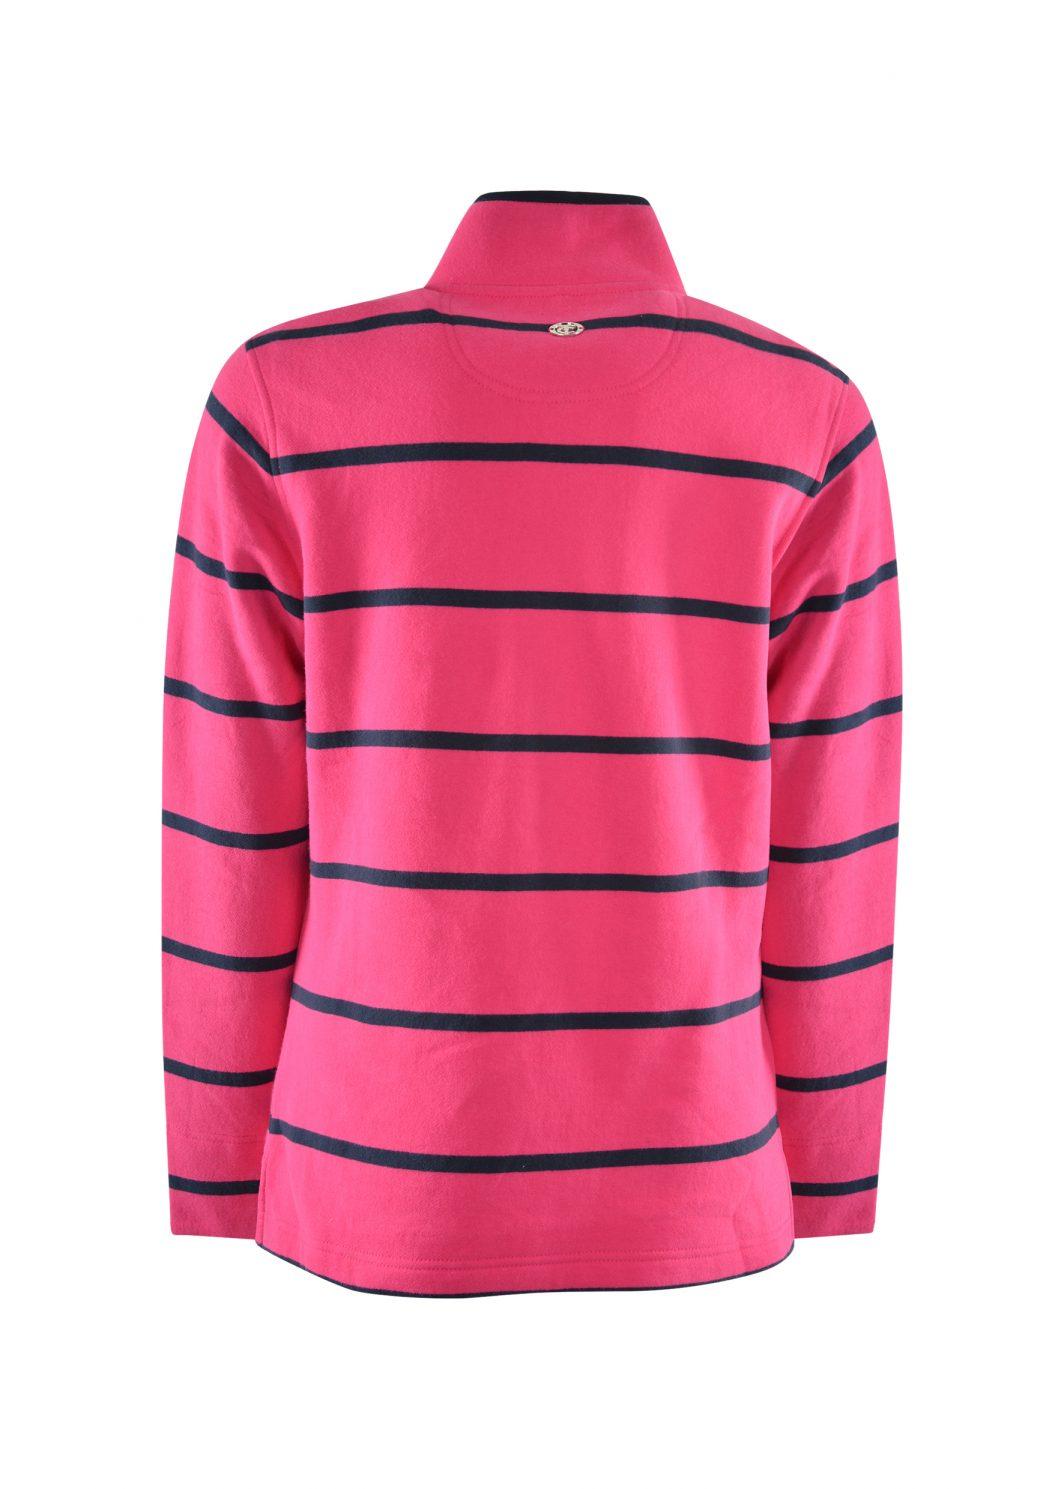 Thomas Cook Women's Windsor Stripe Rugby Dark Navy/Pink